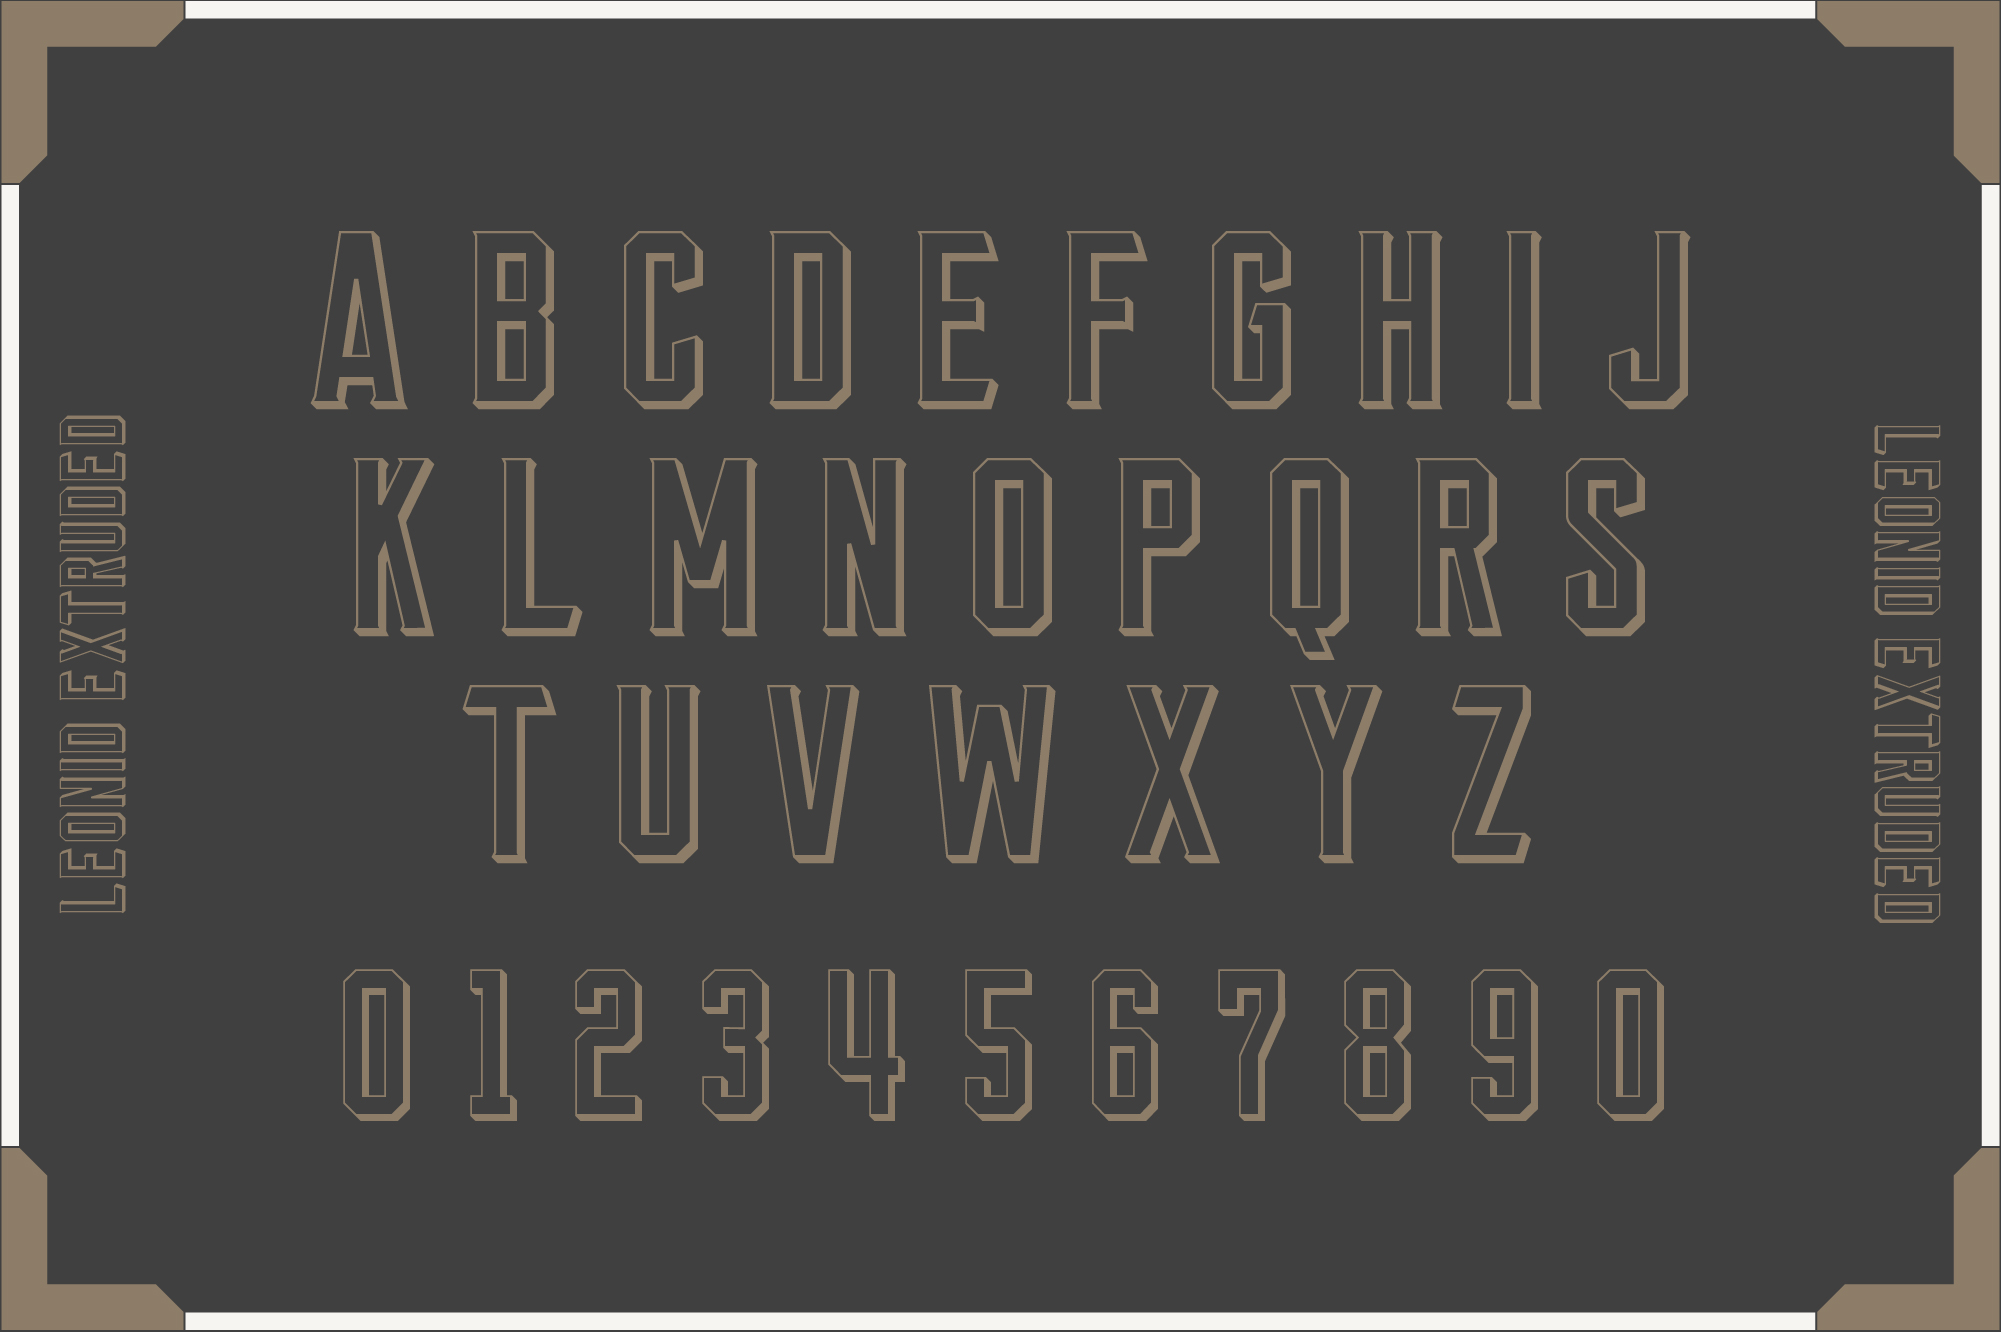 Leonid Retro Layered Font Pack example image 6